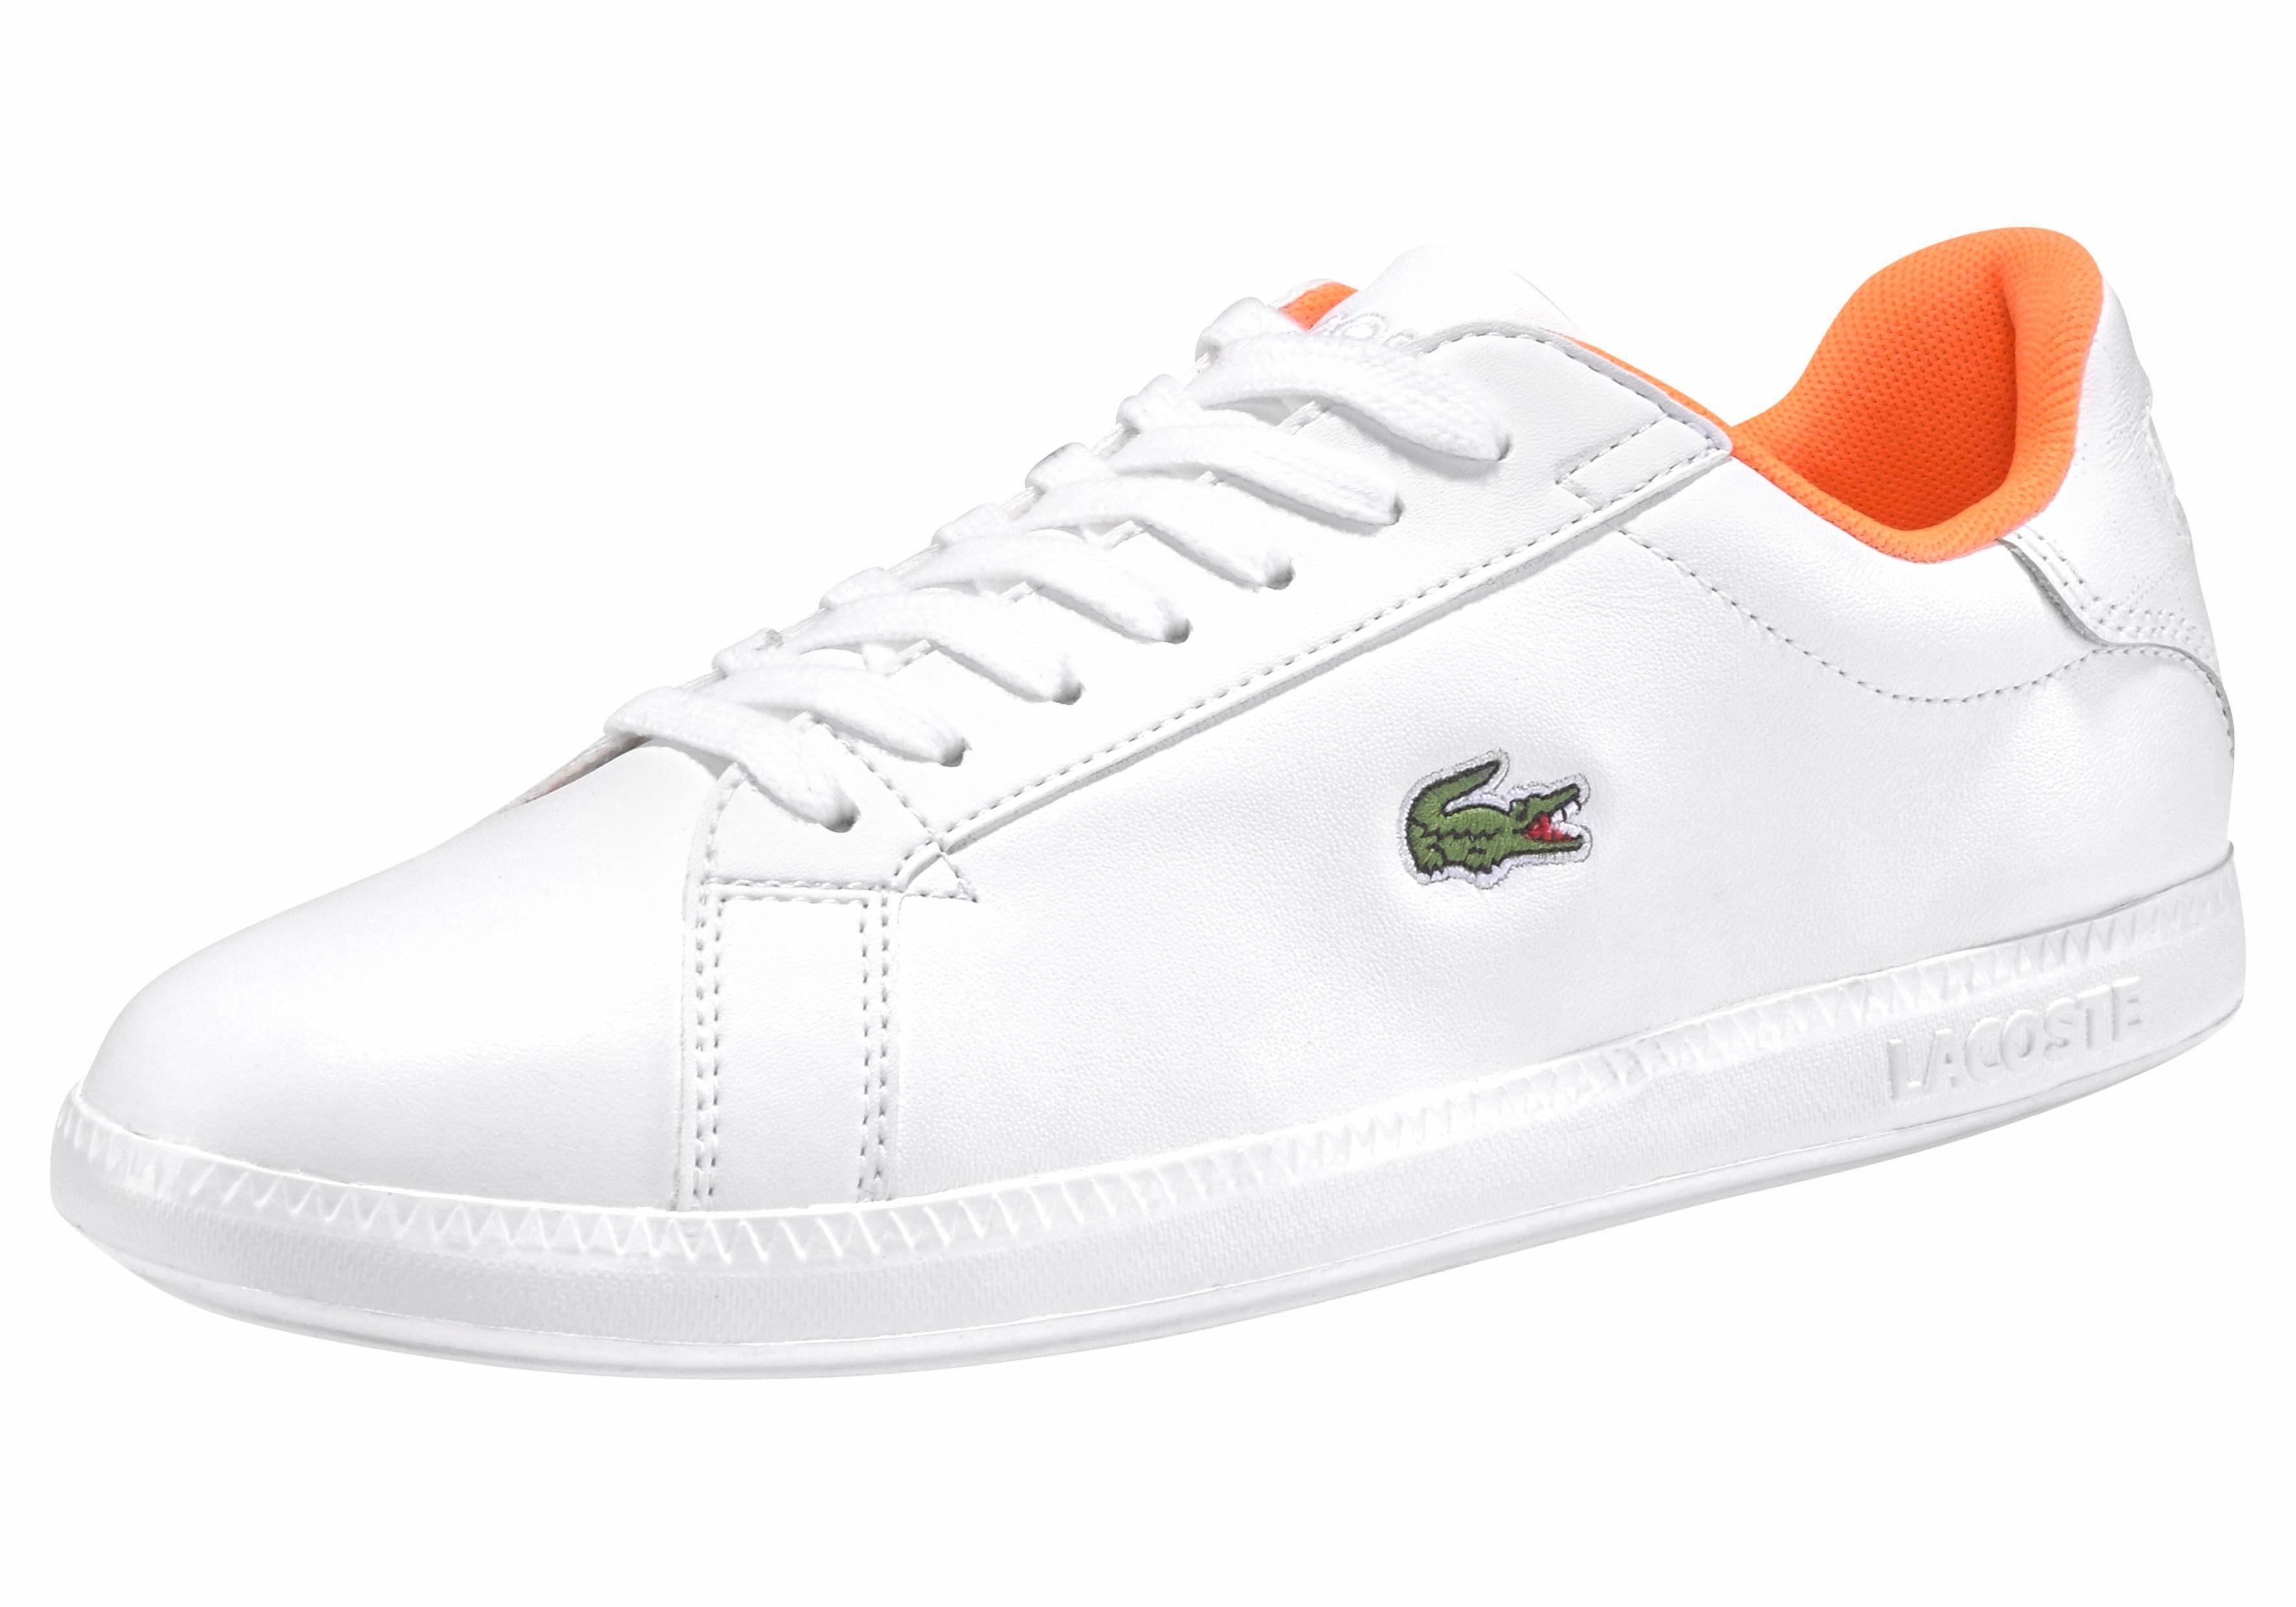 Lacoste Graduate 118 1 SPW Sneaker online kaufen  weiß-neonorange